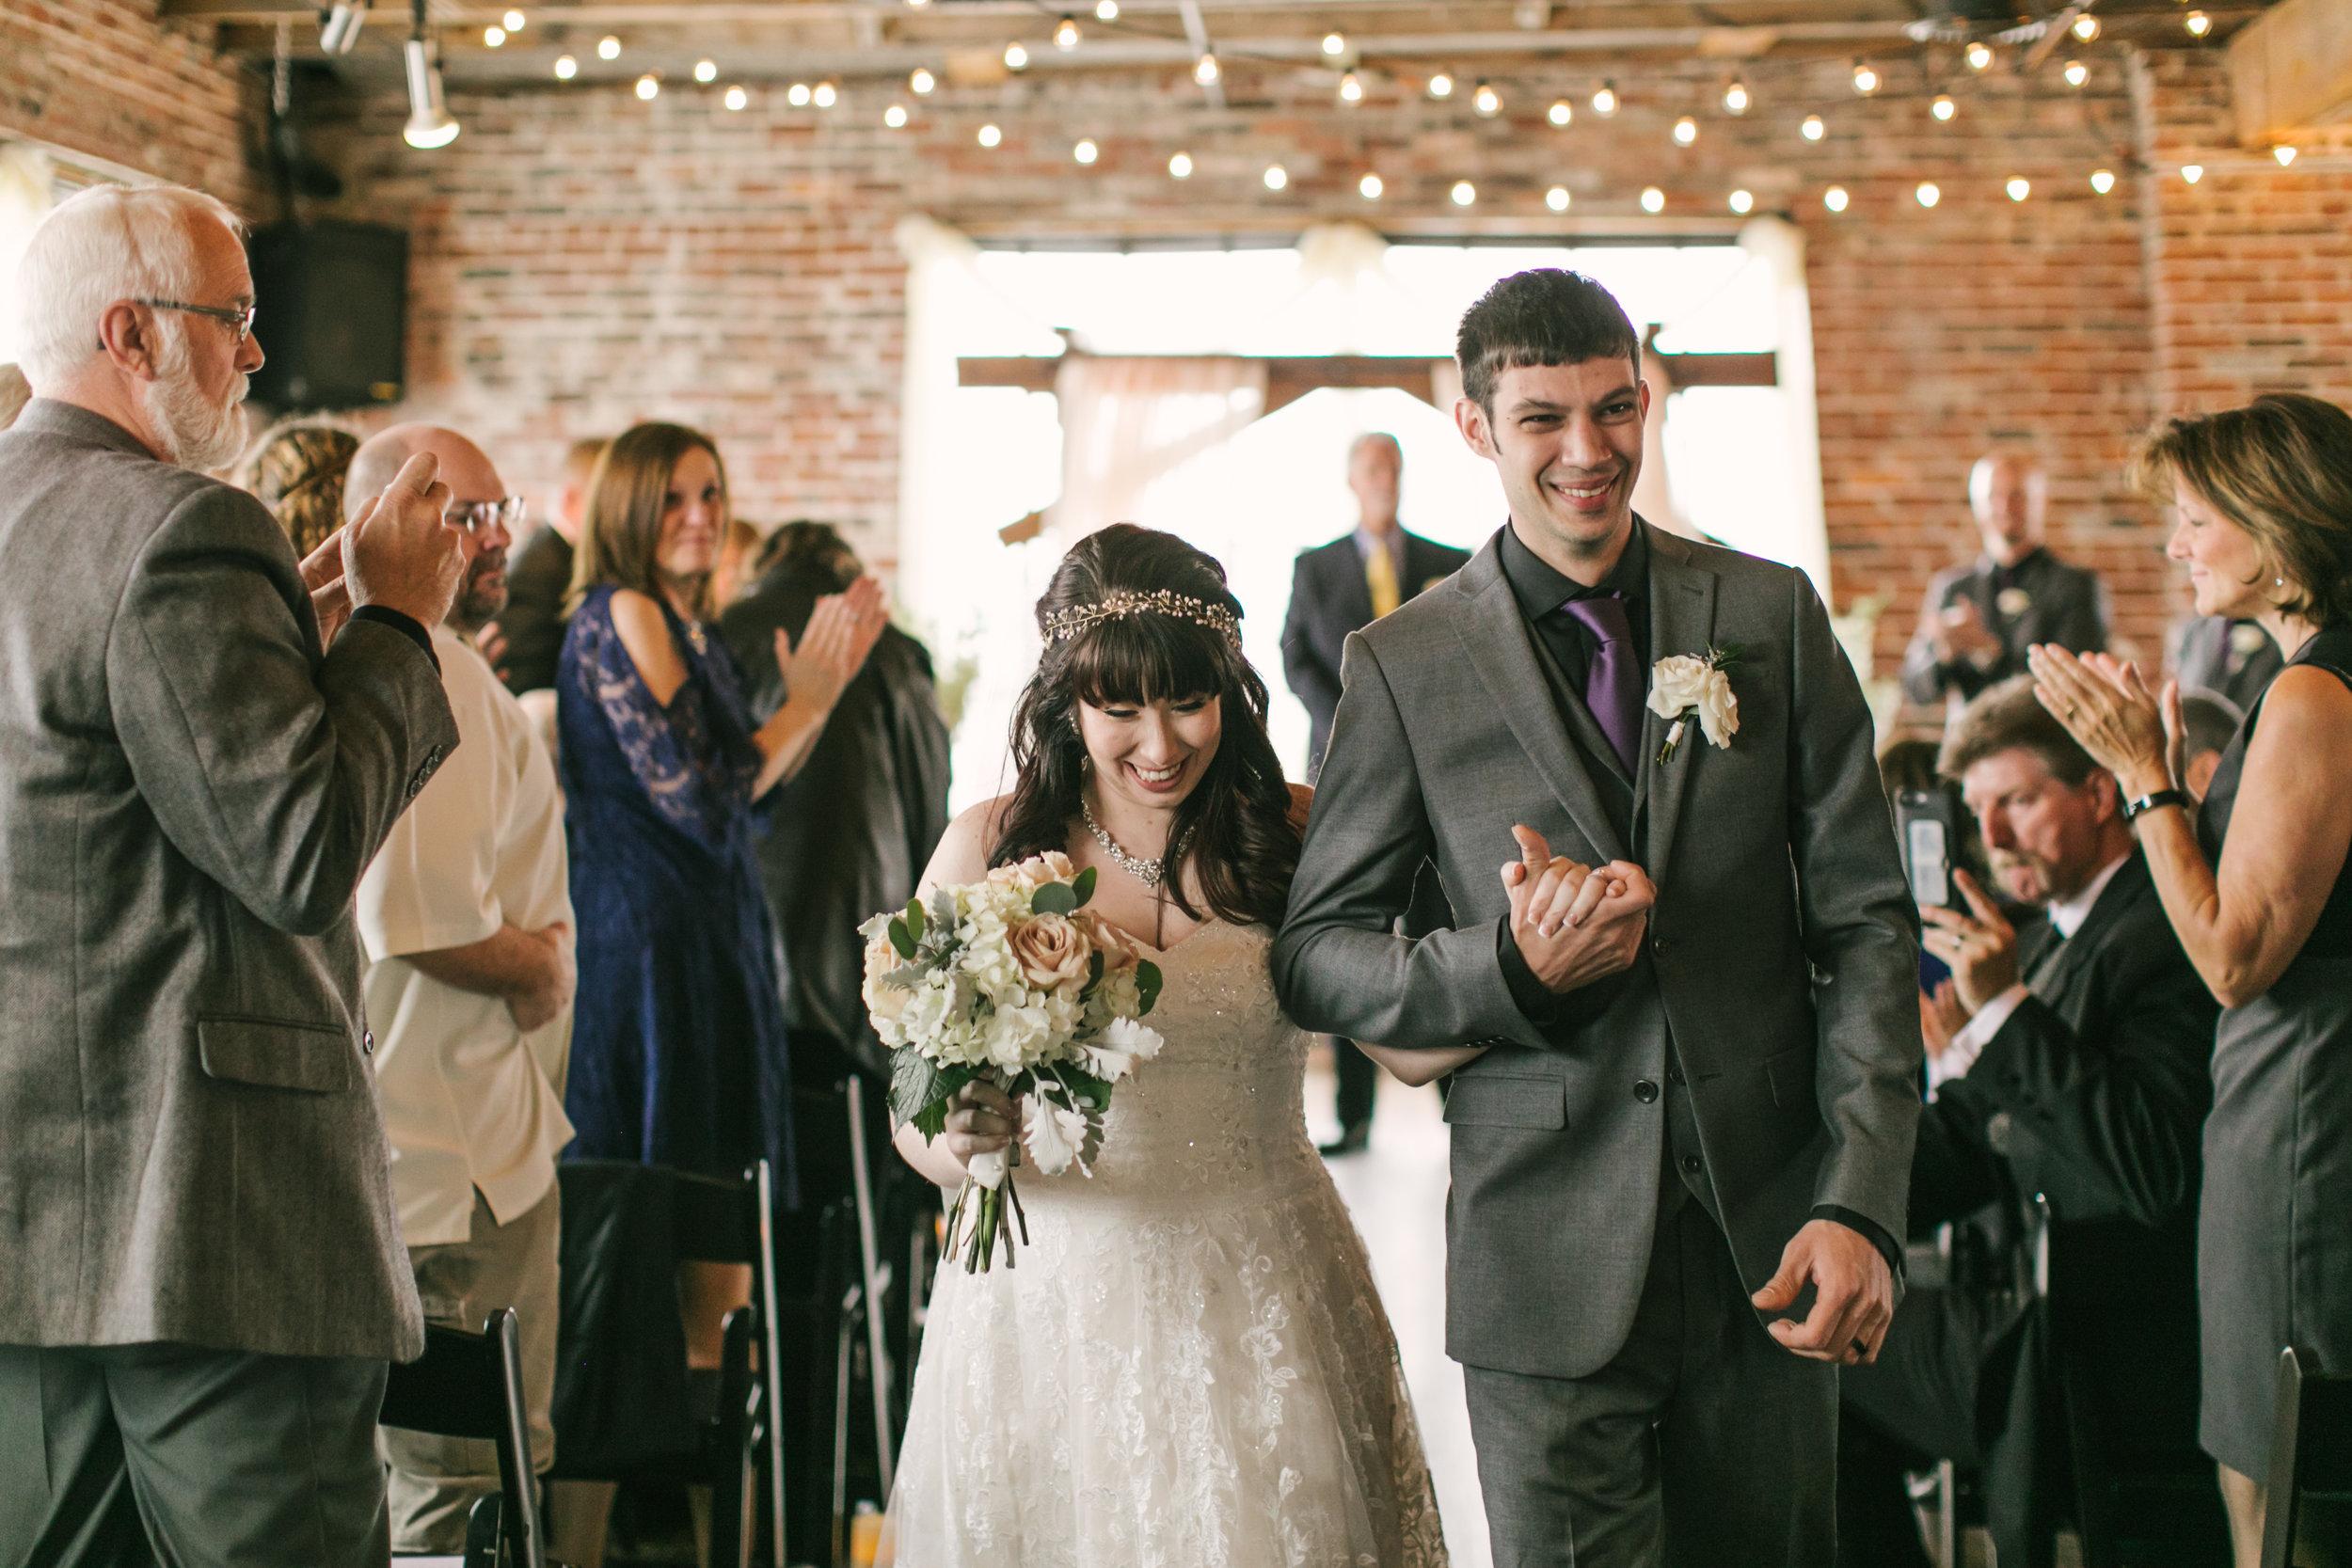 588_Colin+Jessica_Wedding.jpg